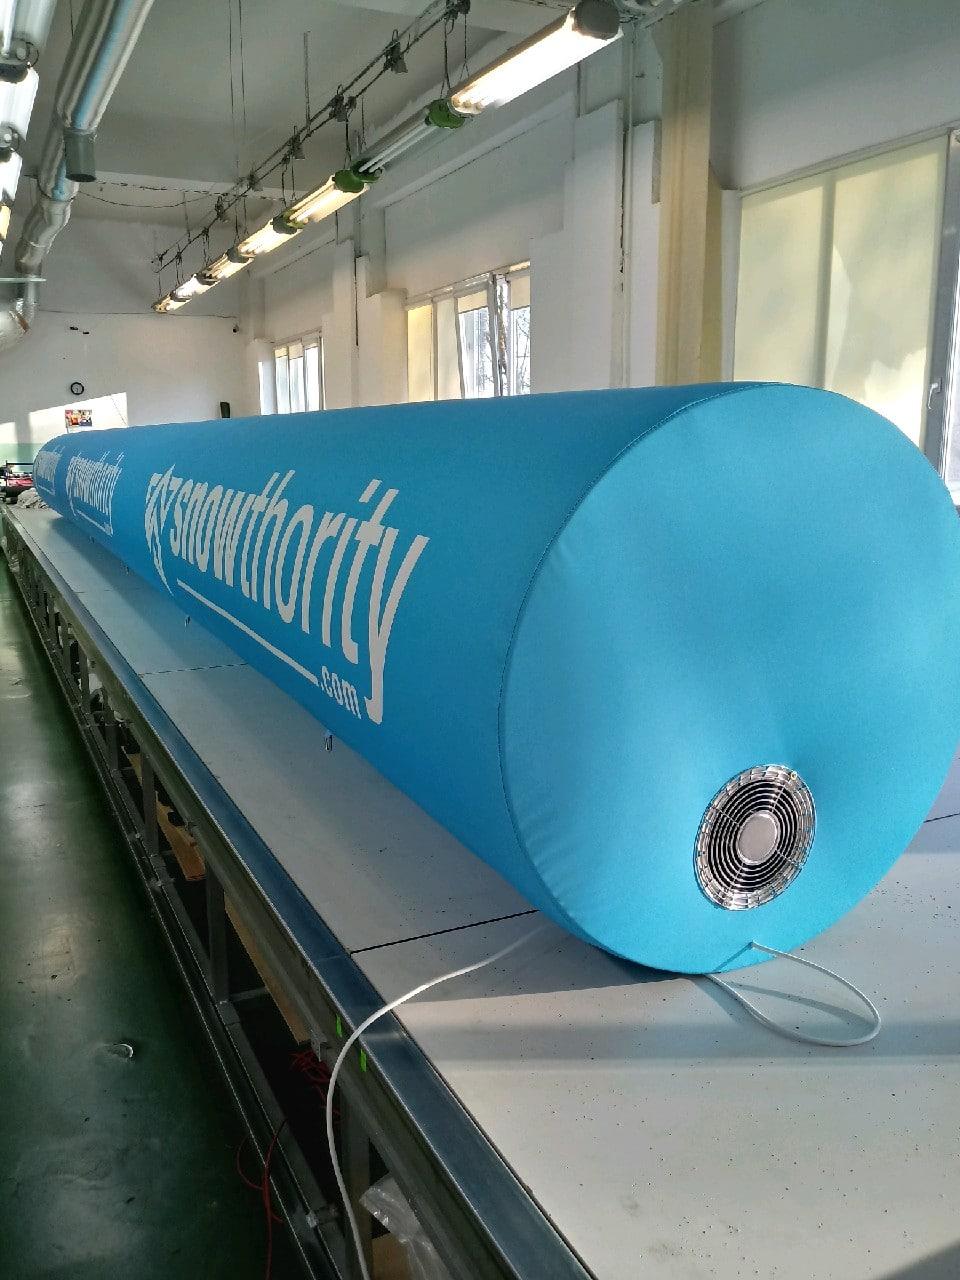 Werbebande Inflatable